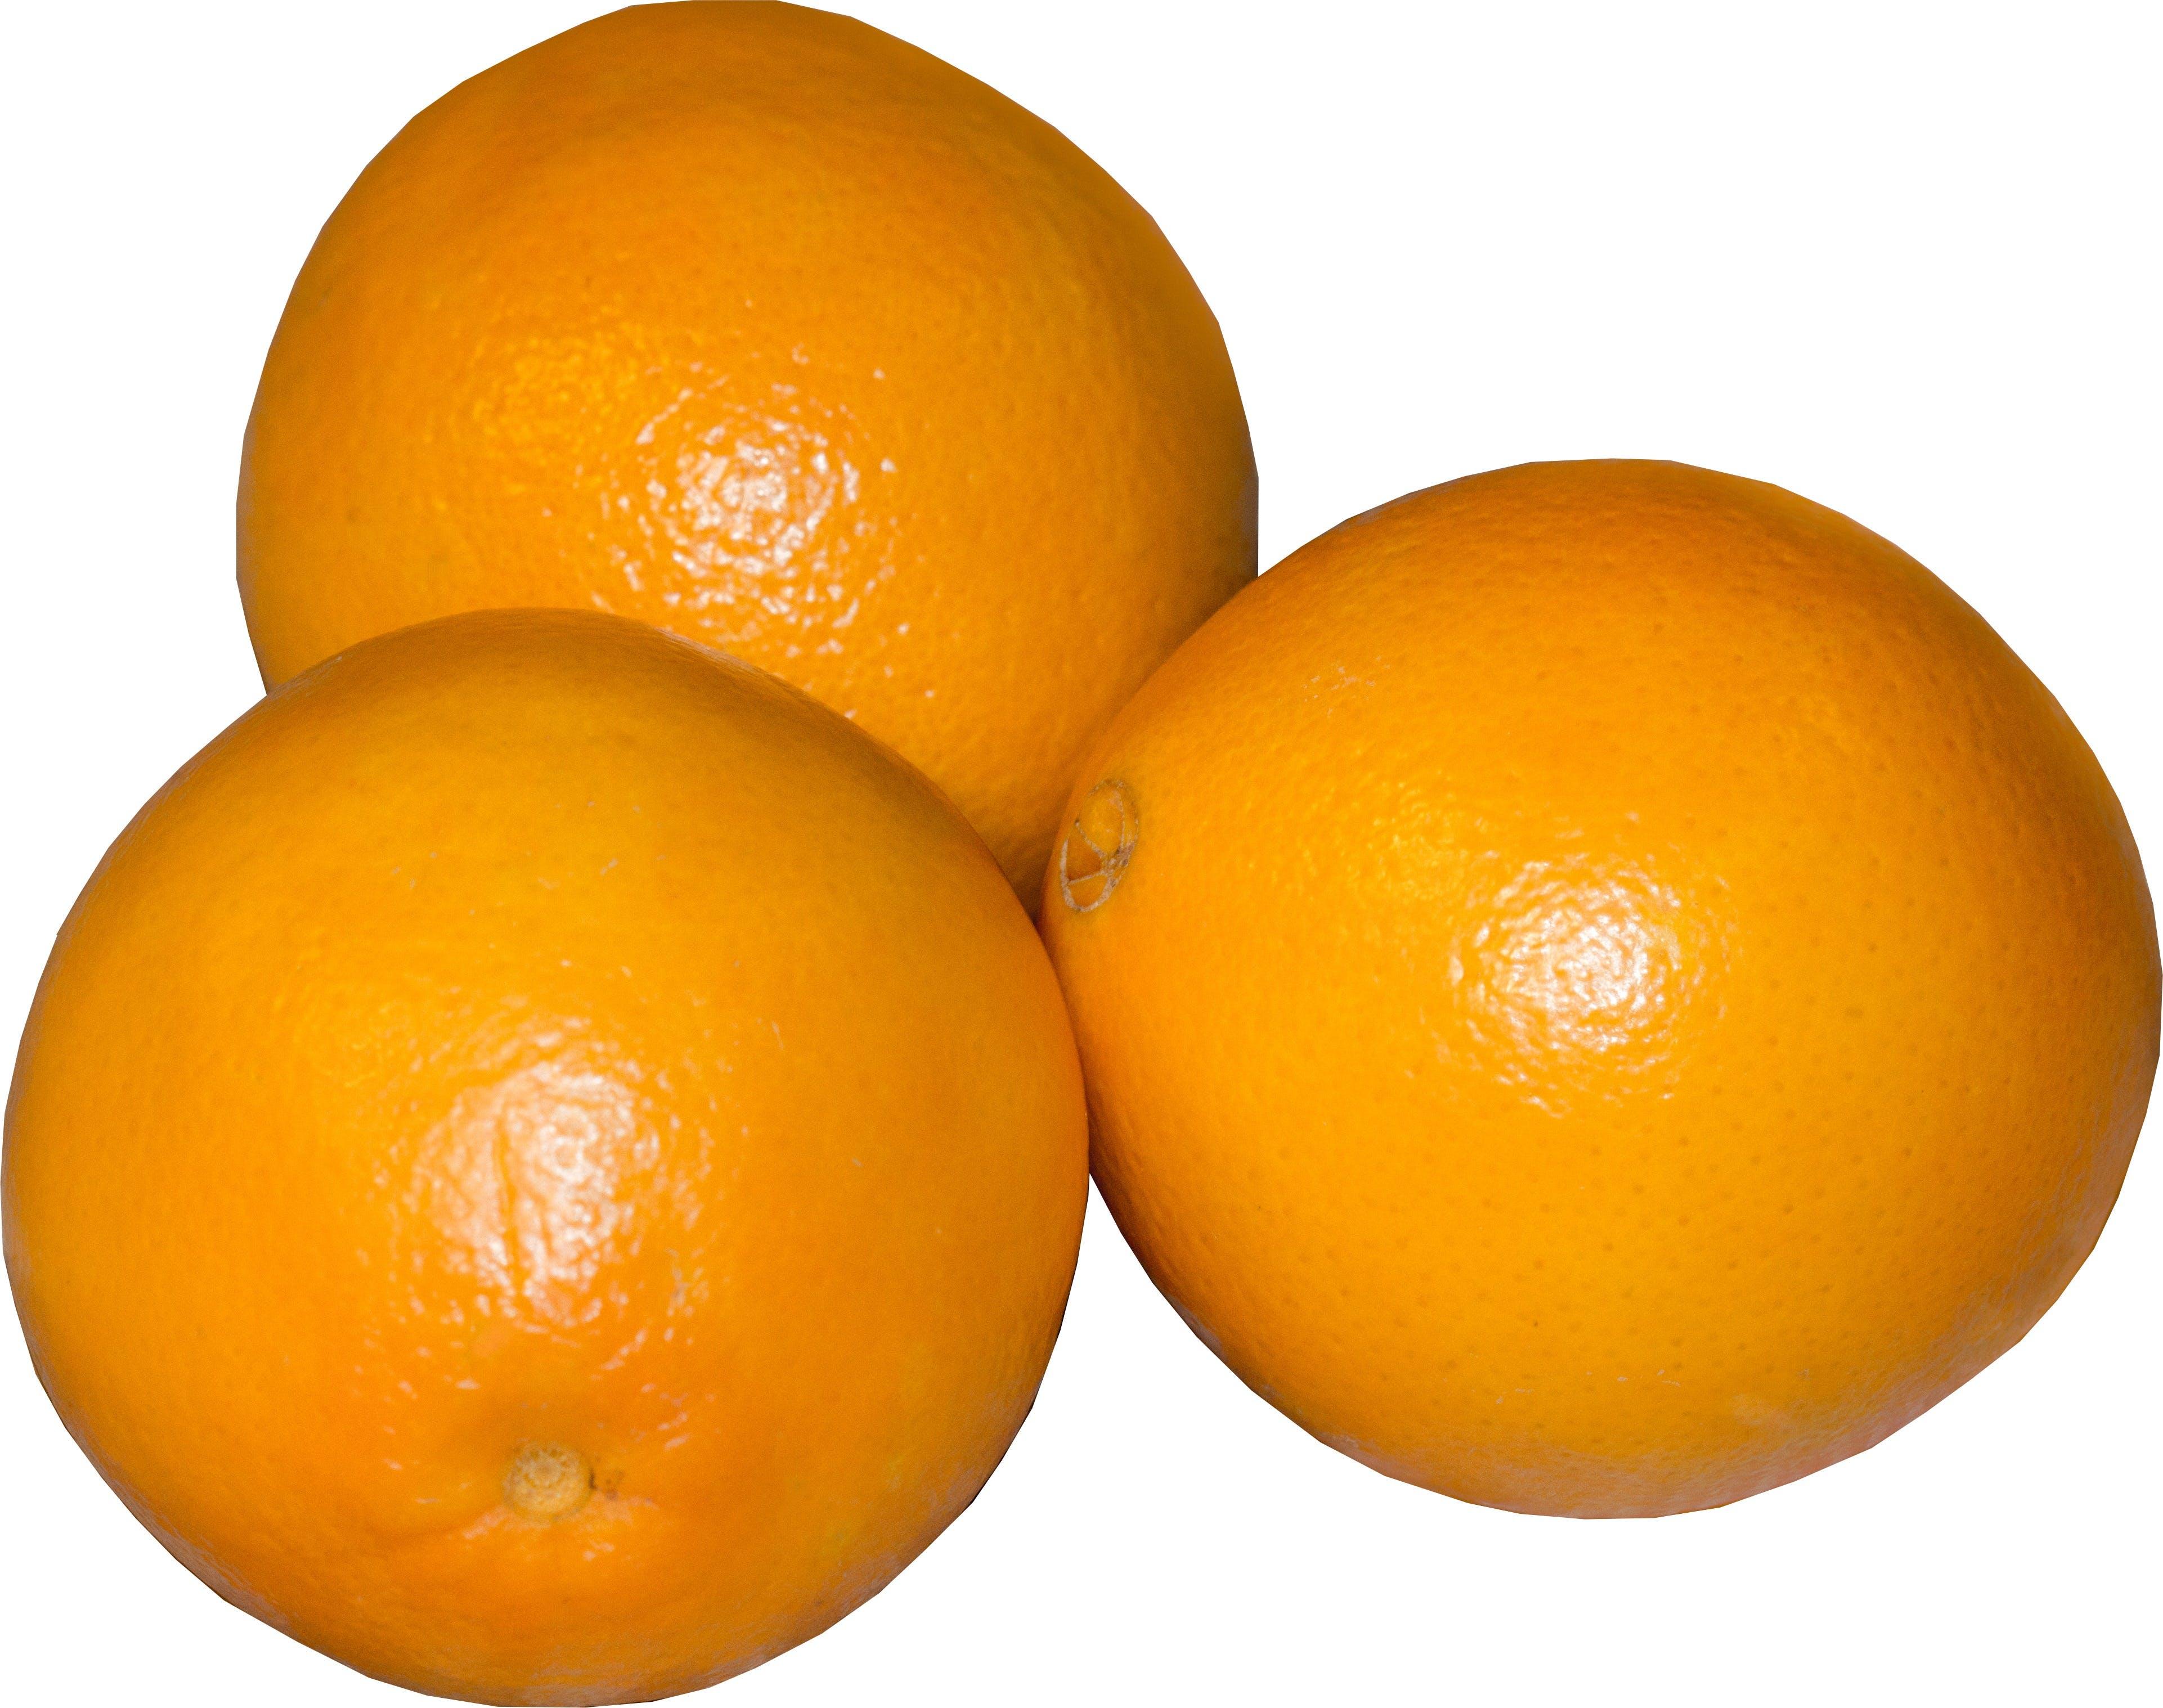 Free stock photo of food, orange, sweet, draft